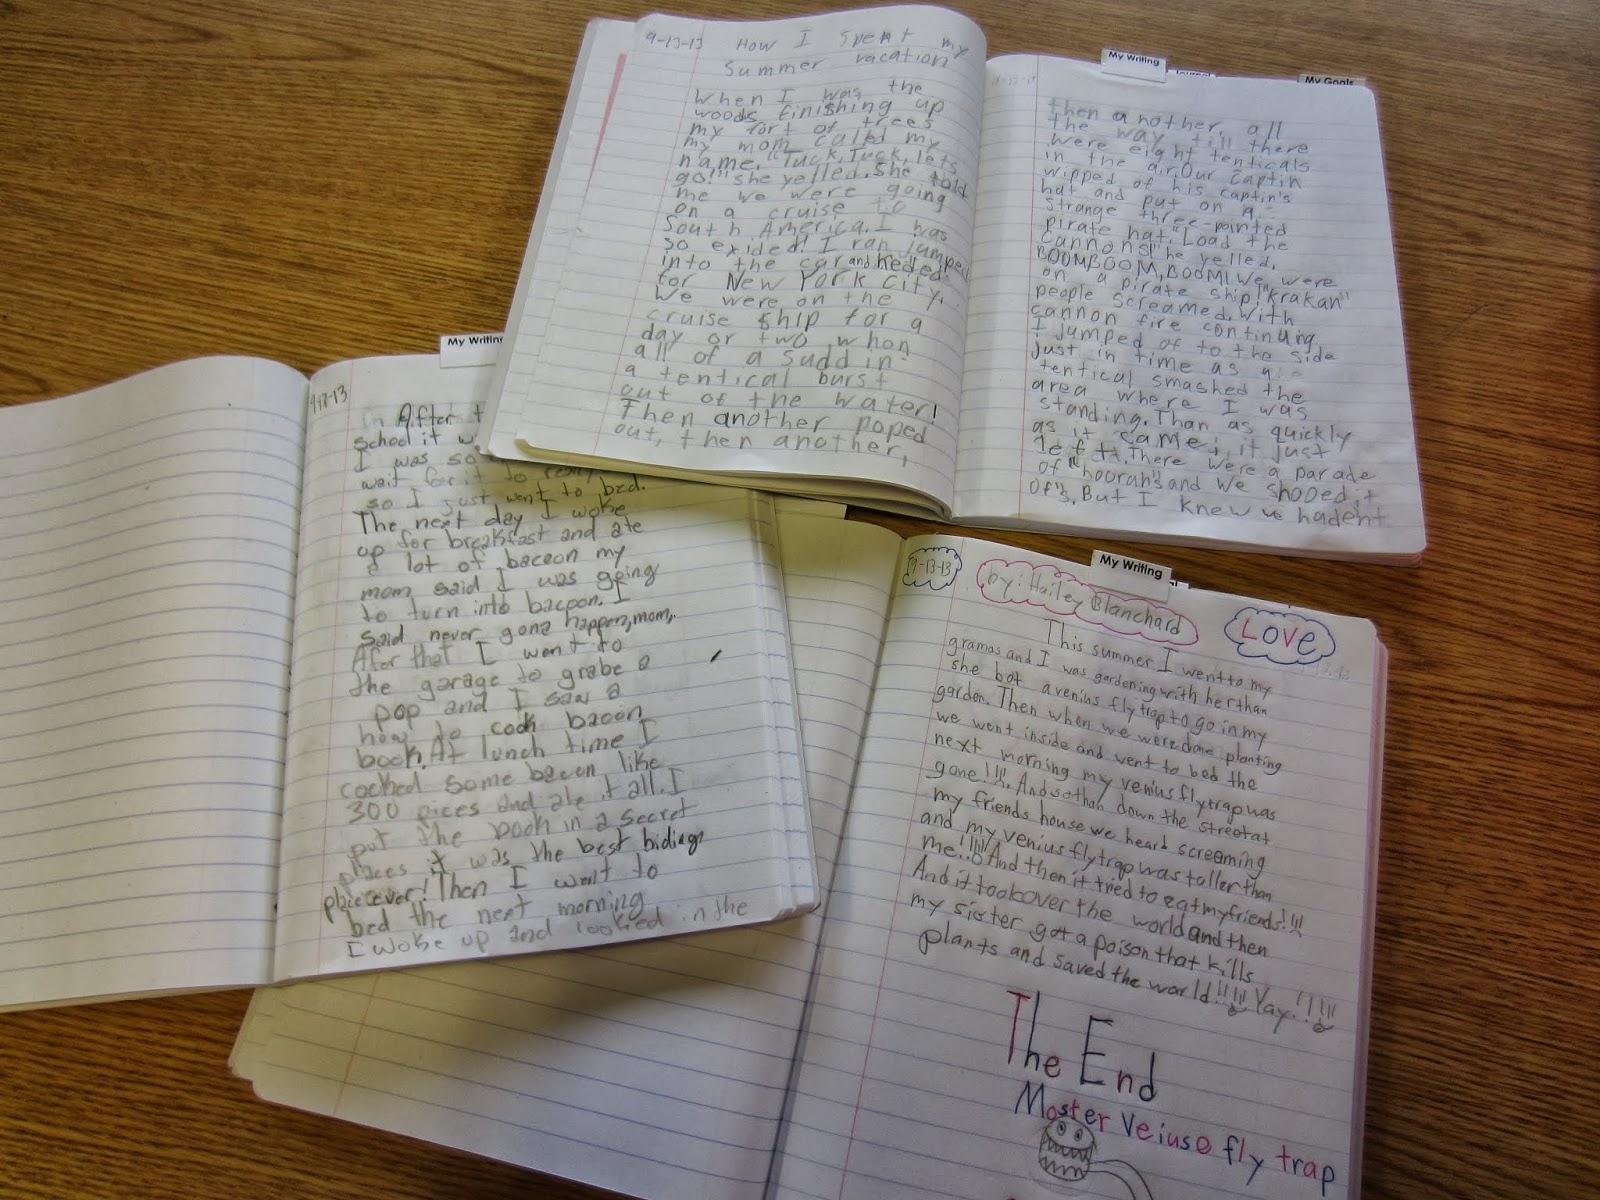 my holiday vacation essay deception essay othello essay the theme  how i spent my holidays essay for kids summer holiday essay for kids essay on how